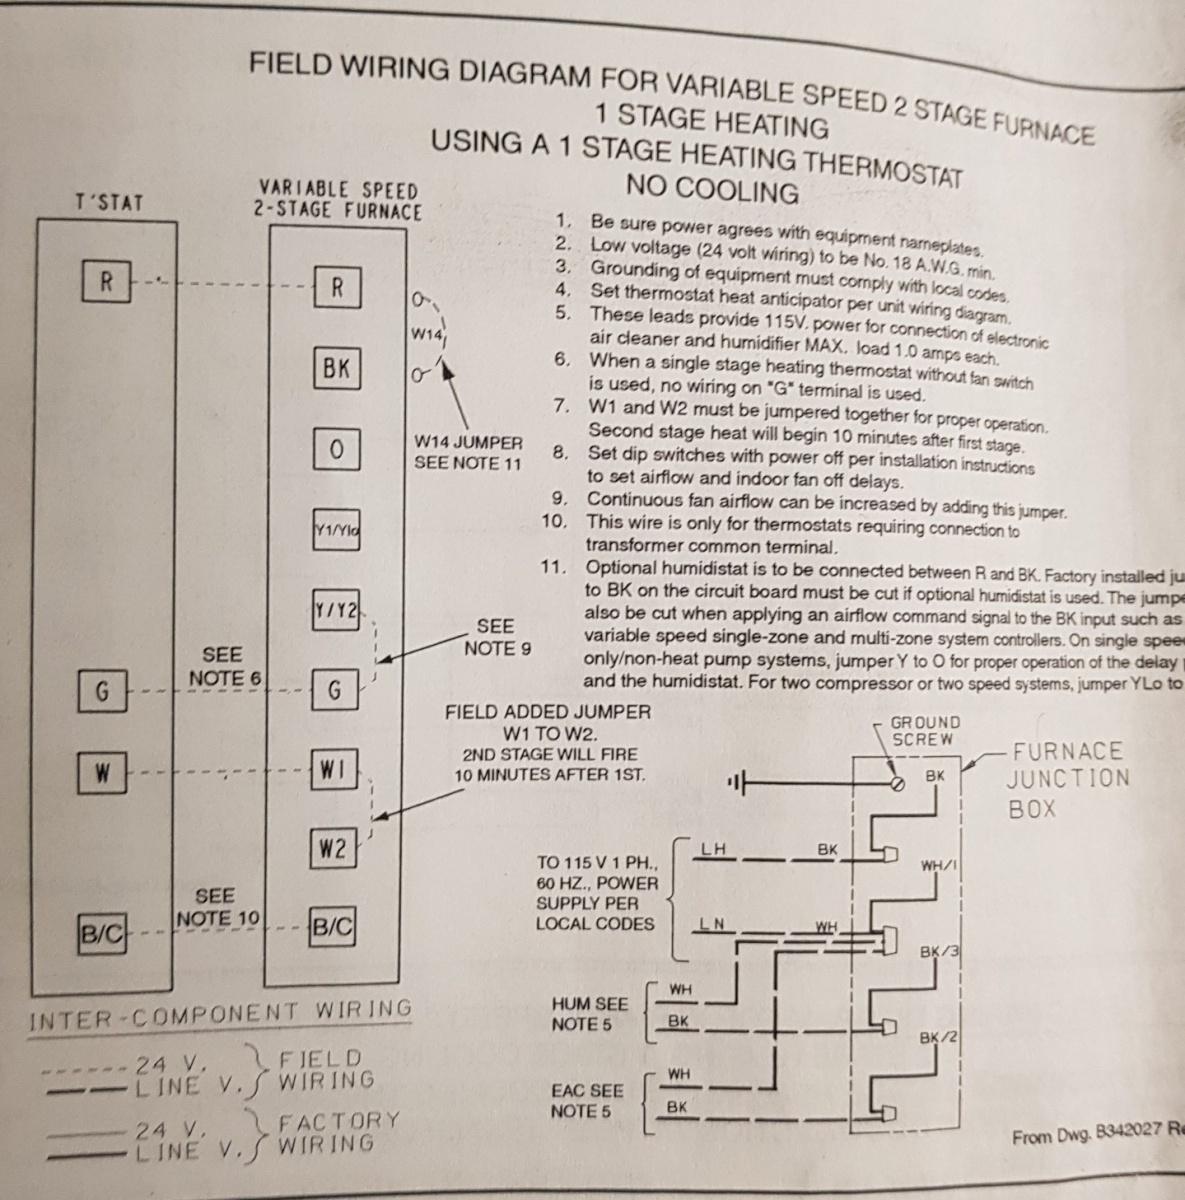 Trane Xv80 - Single Stage Heating Only Wiring - Hvac